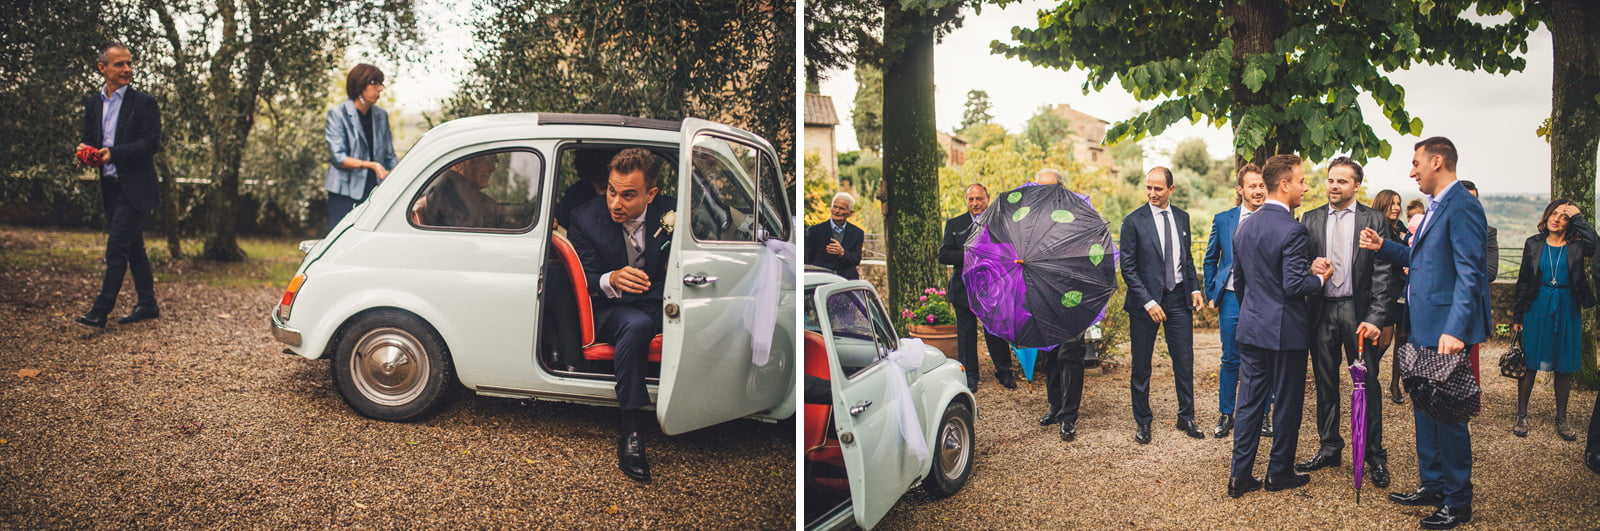 024-wedding-florence-palazzo-borghese